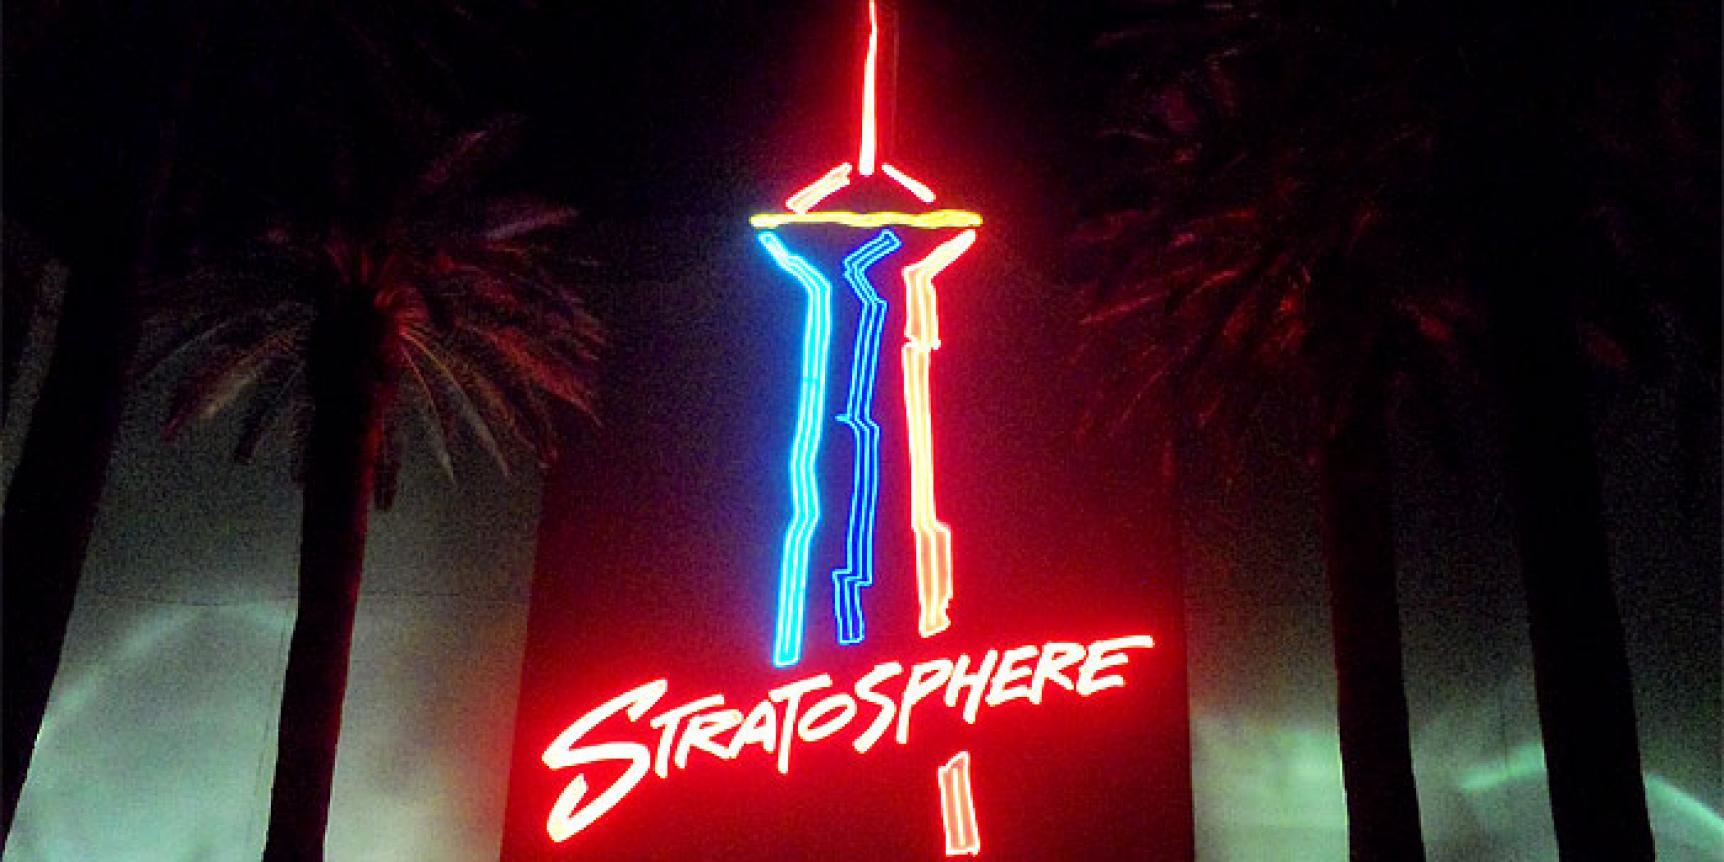 Stratosphere Hotel, Casino & Tower Las Vegas